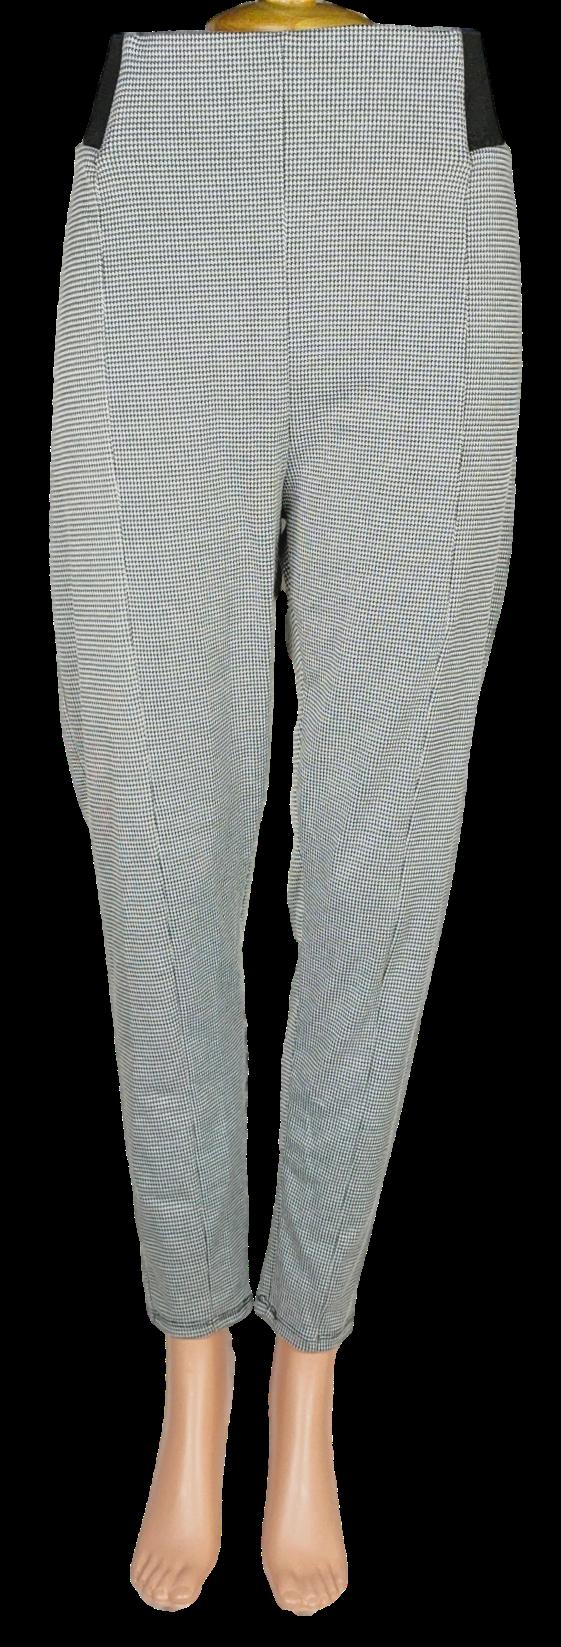 Pantalon Kiabi -Taille 44